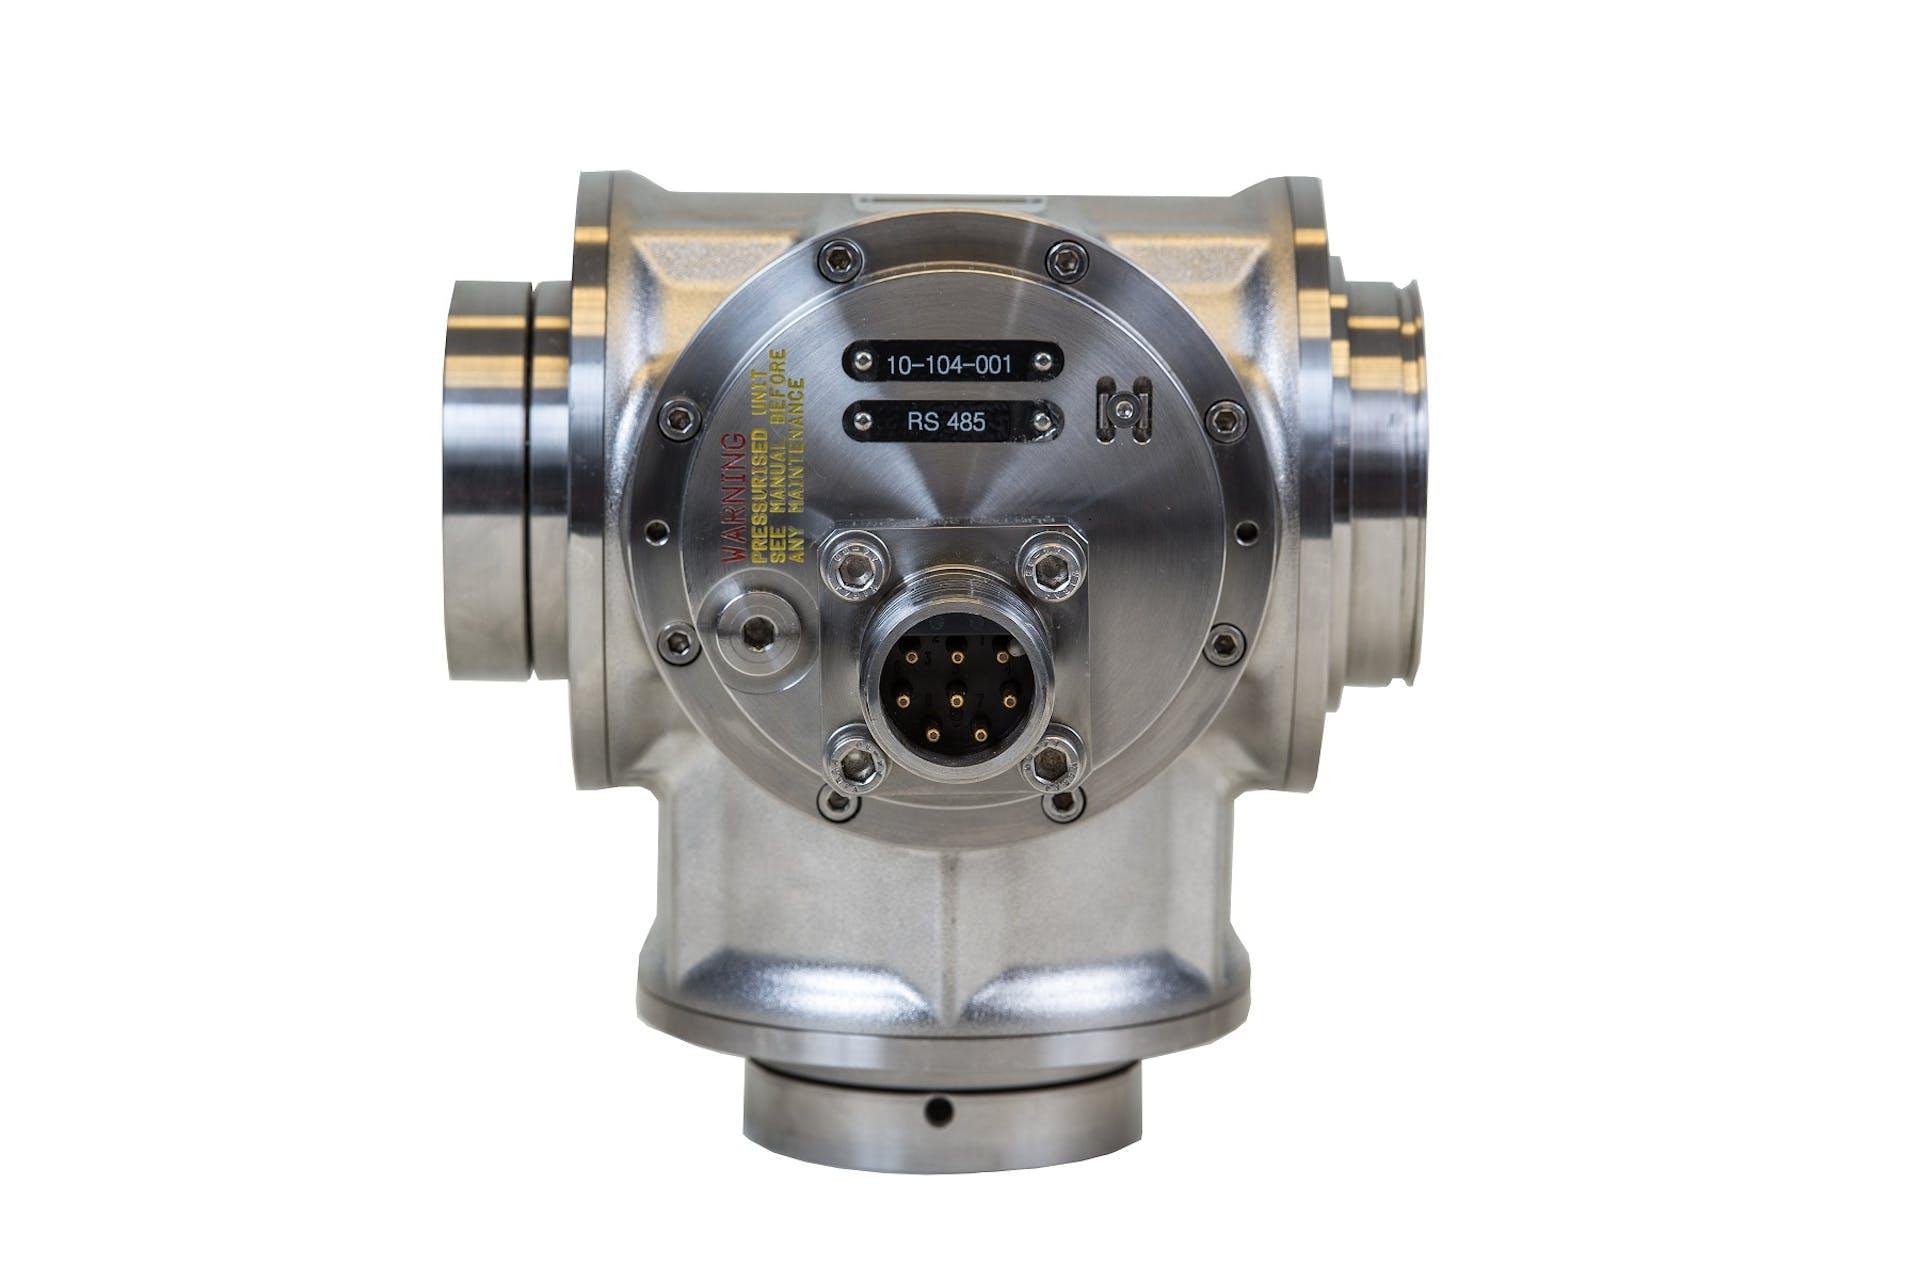 OE10-104 Medium Duty Pan & Tilt